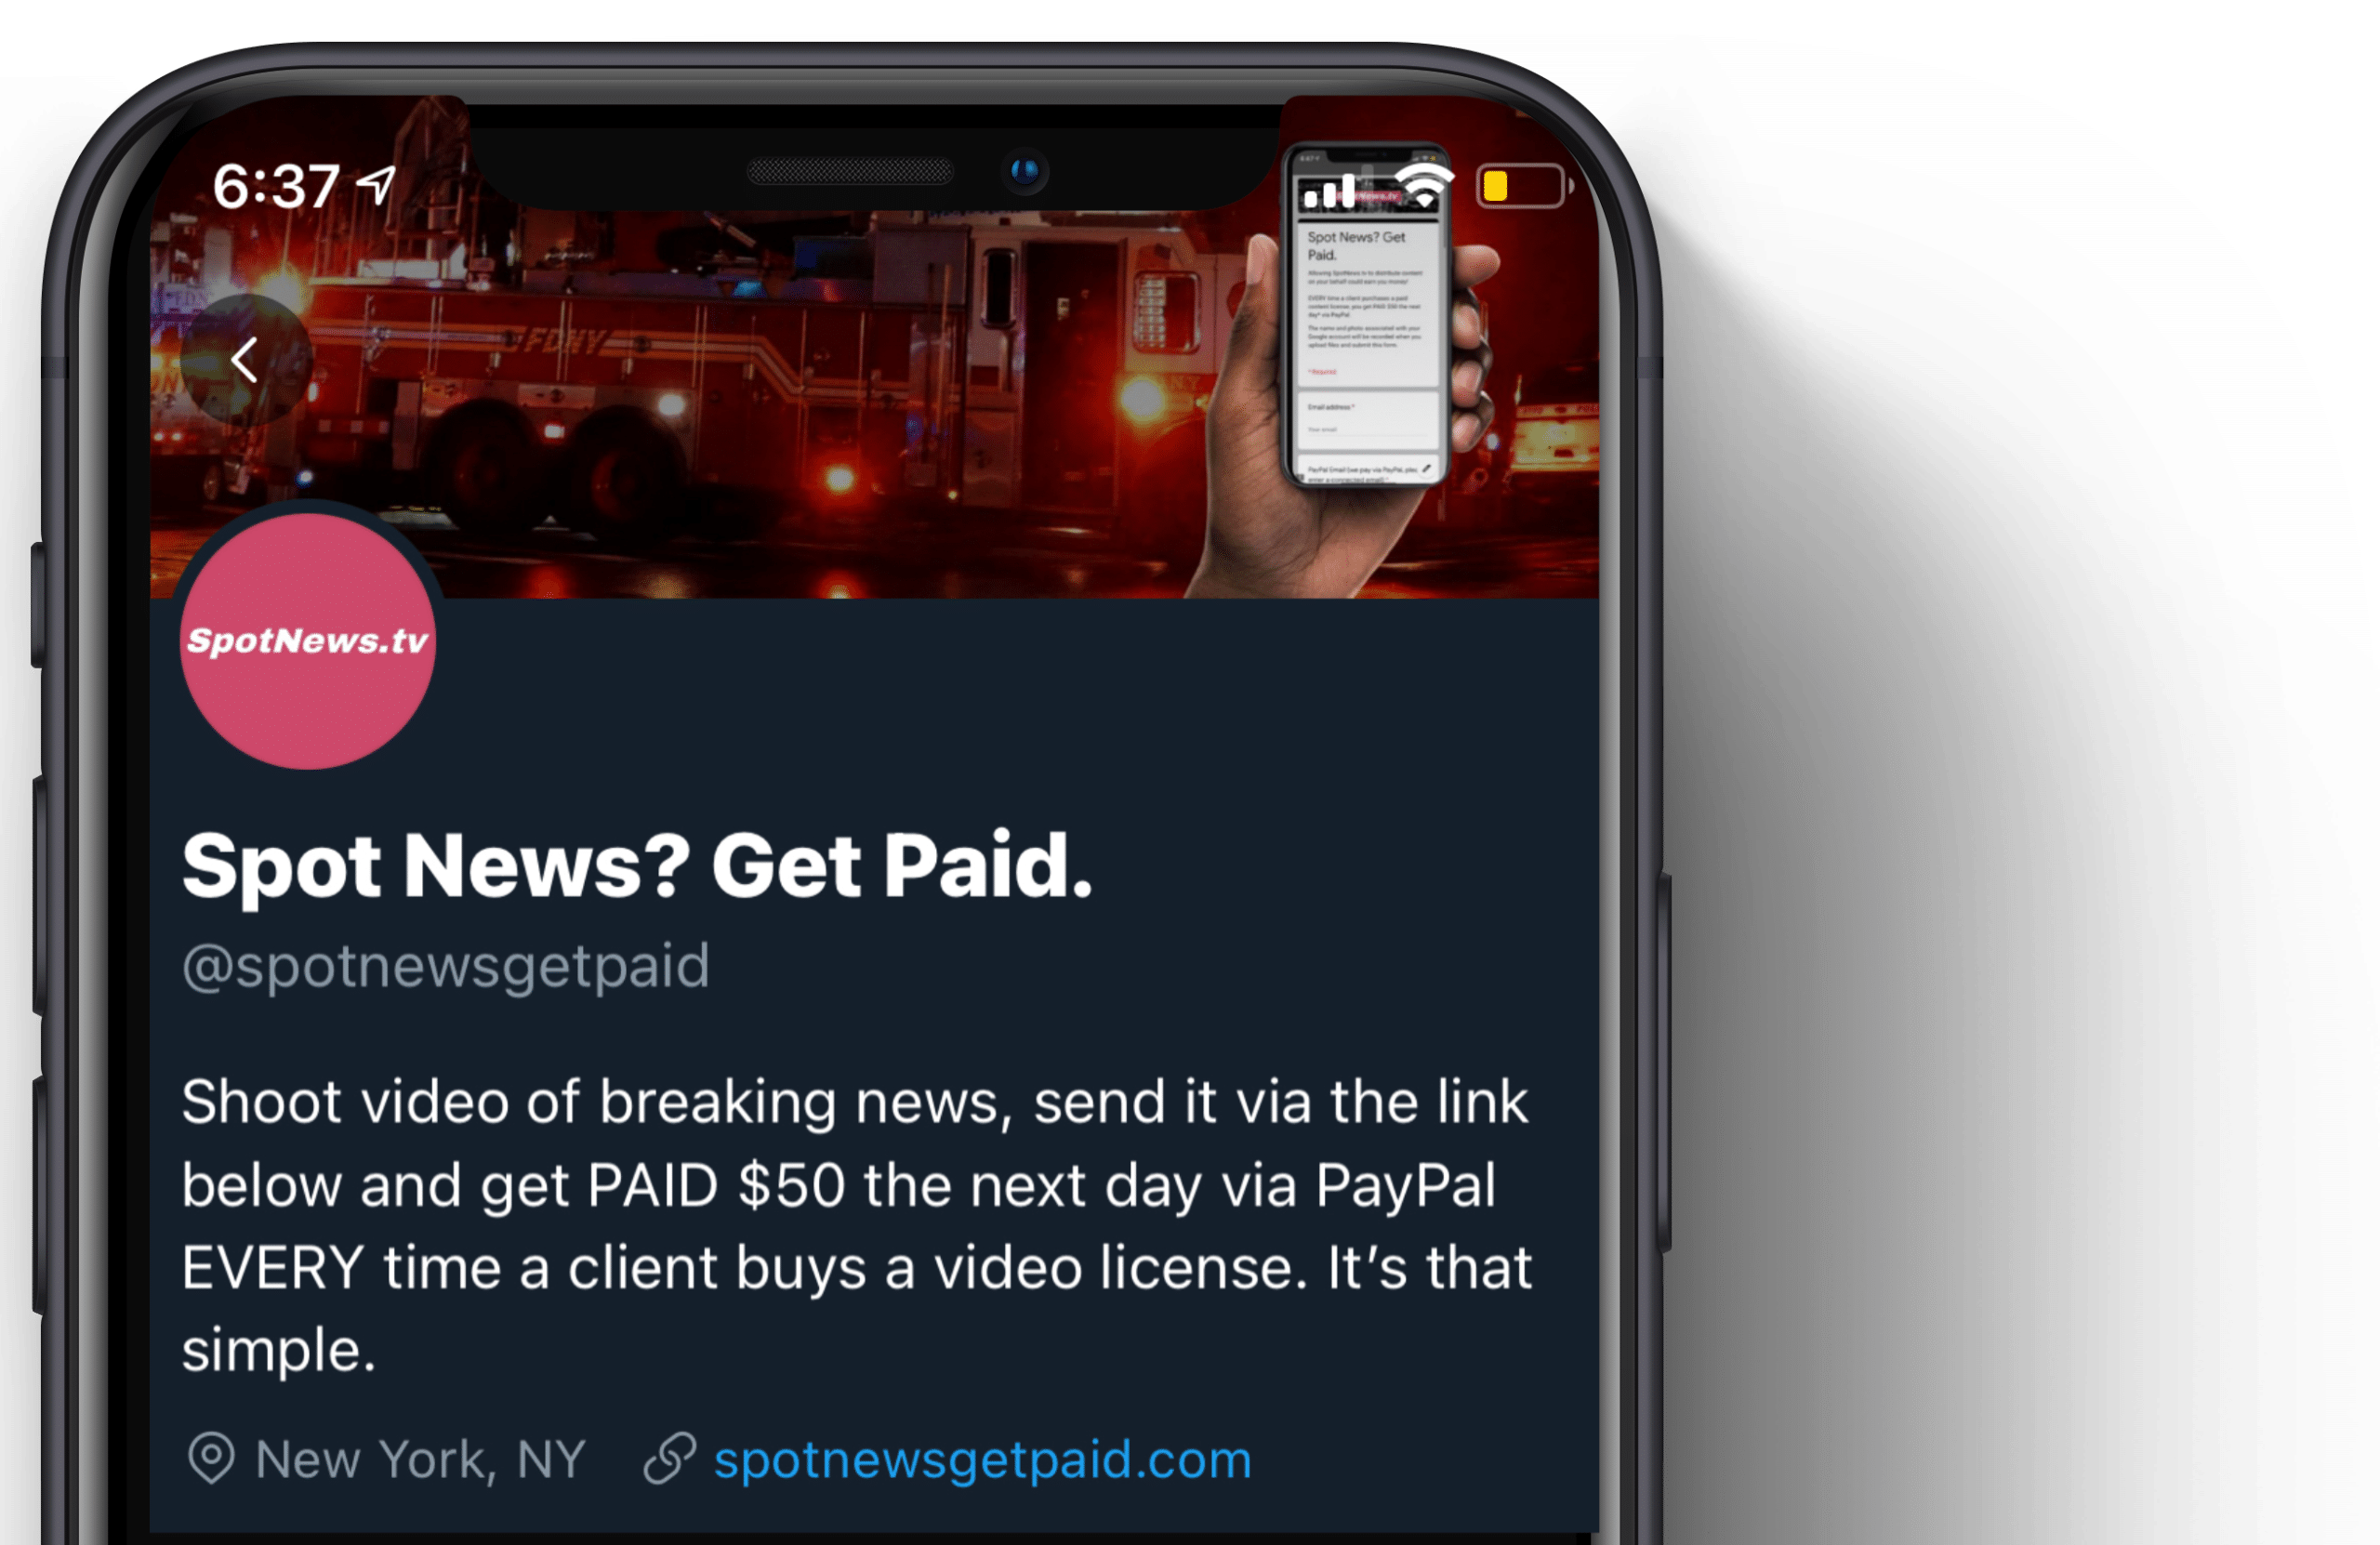 https://www.spotnewsgetpaid.com/wp-content/uploads/2021/02/iphone-tweet-1.png